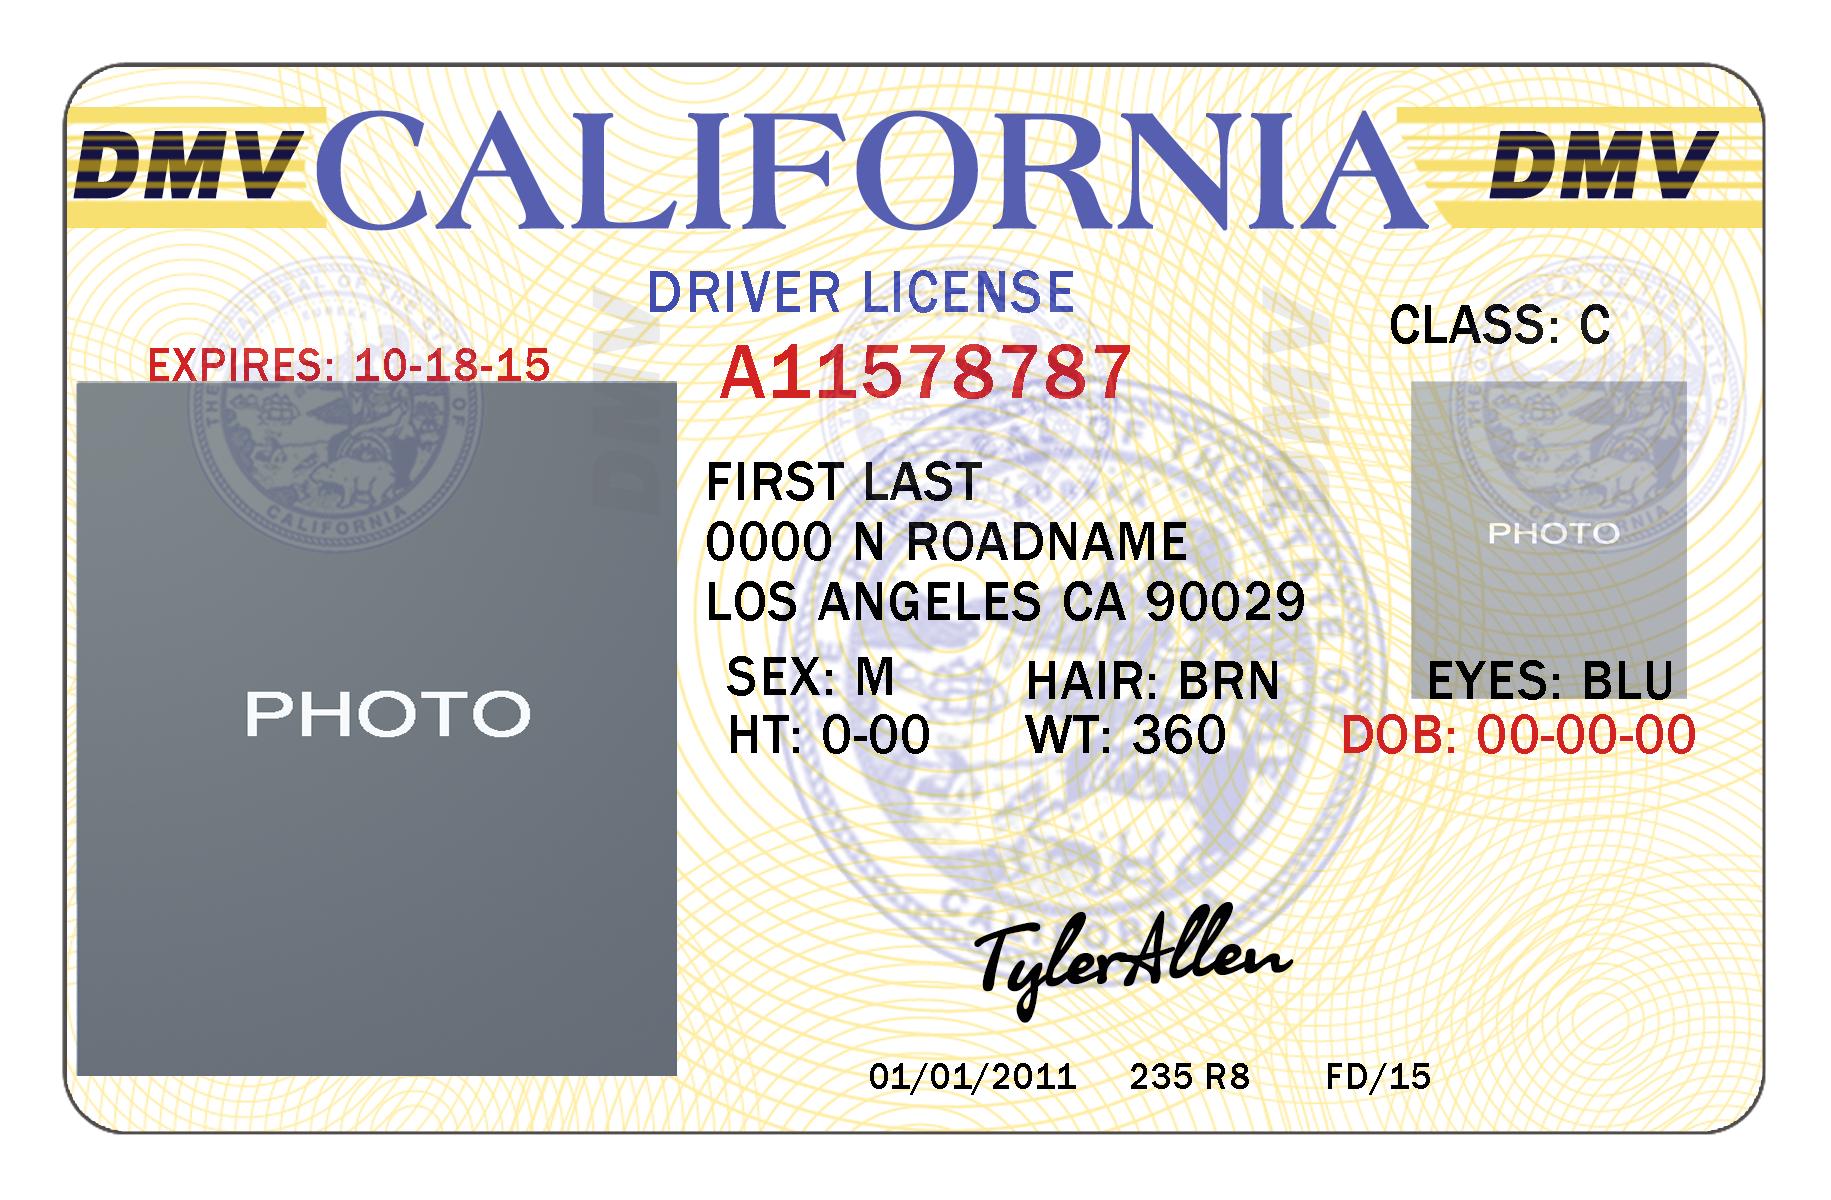 California Drivers License Template   California   Drivers License - Free Printable Fake Drivers License